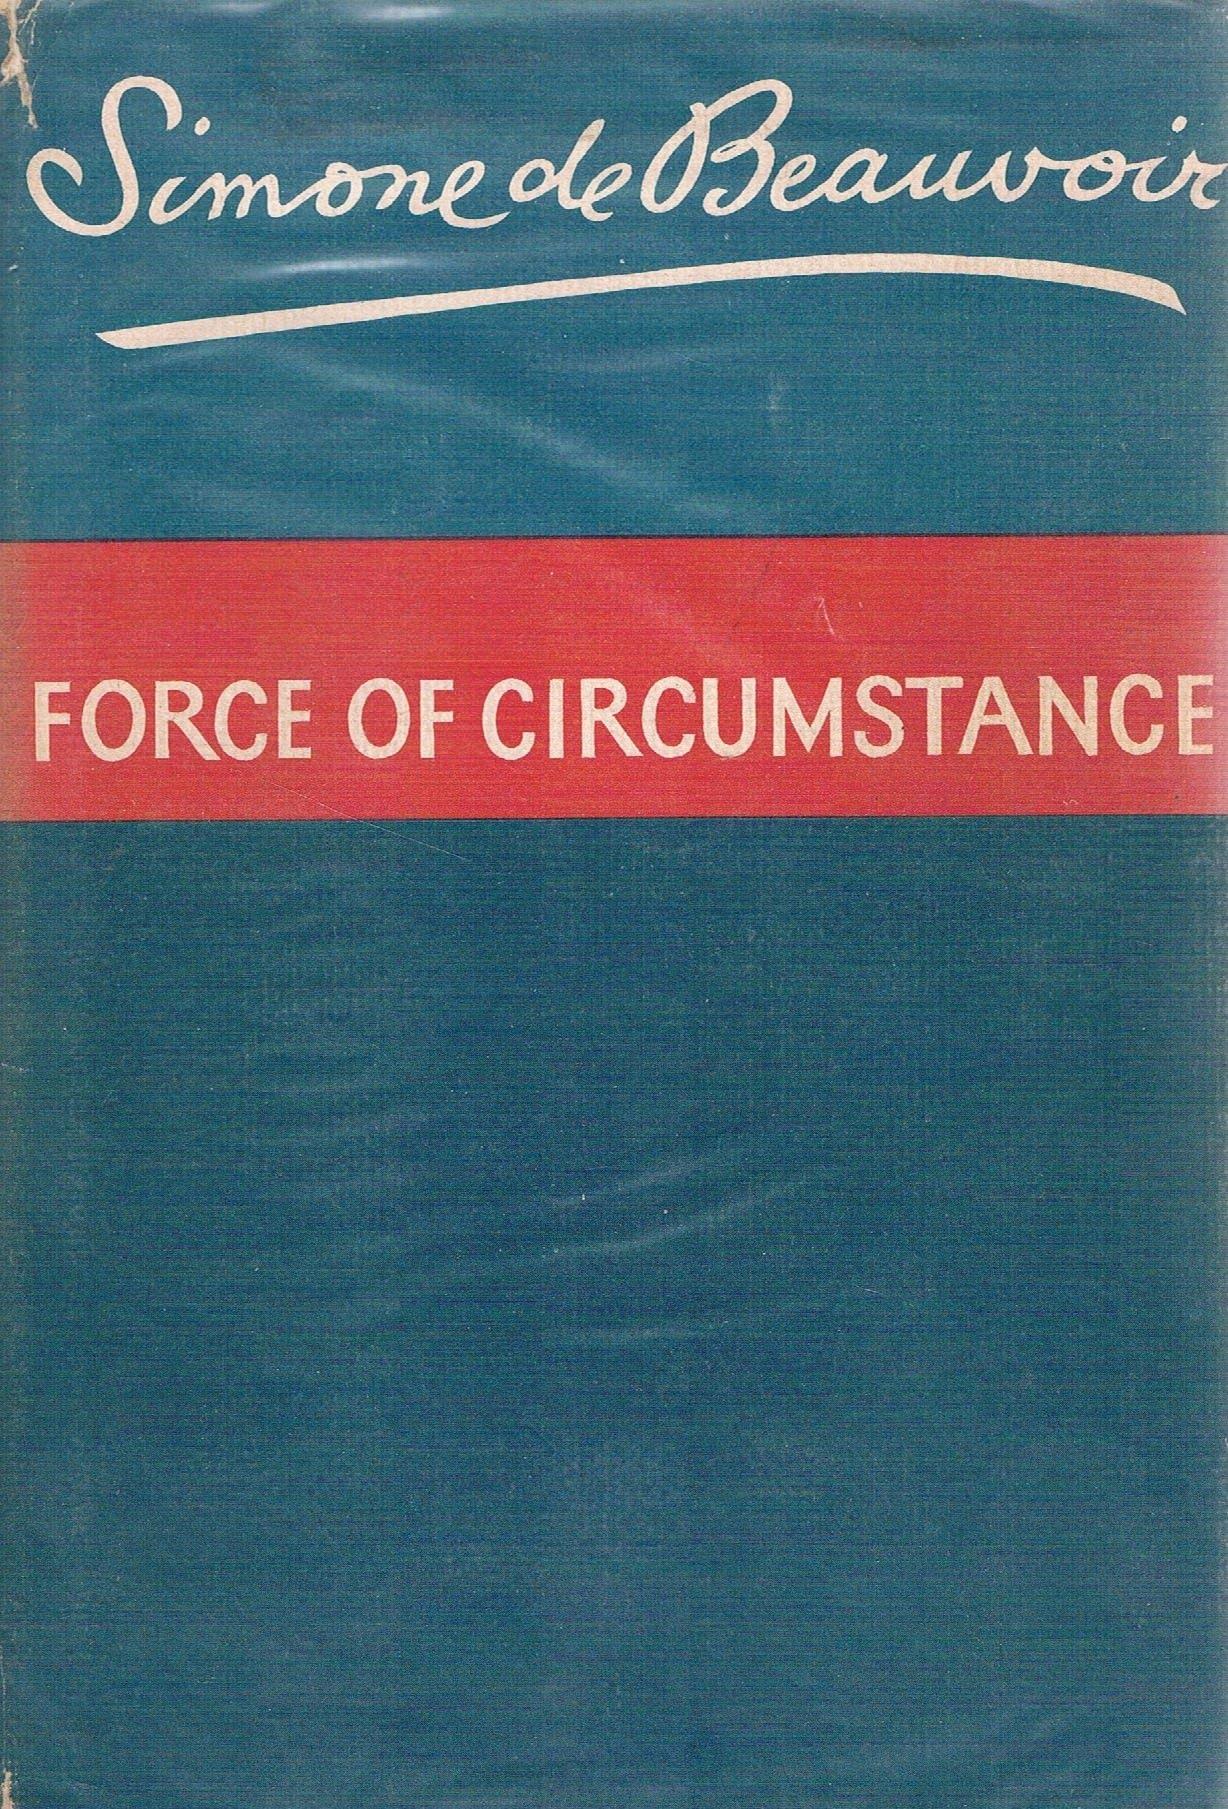 Force of Circumstance: Simone de Beauvoir, R. Howard: 9780233957470:  Amazon.com: Books